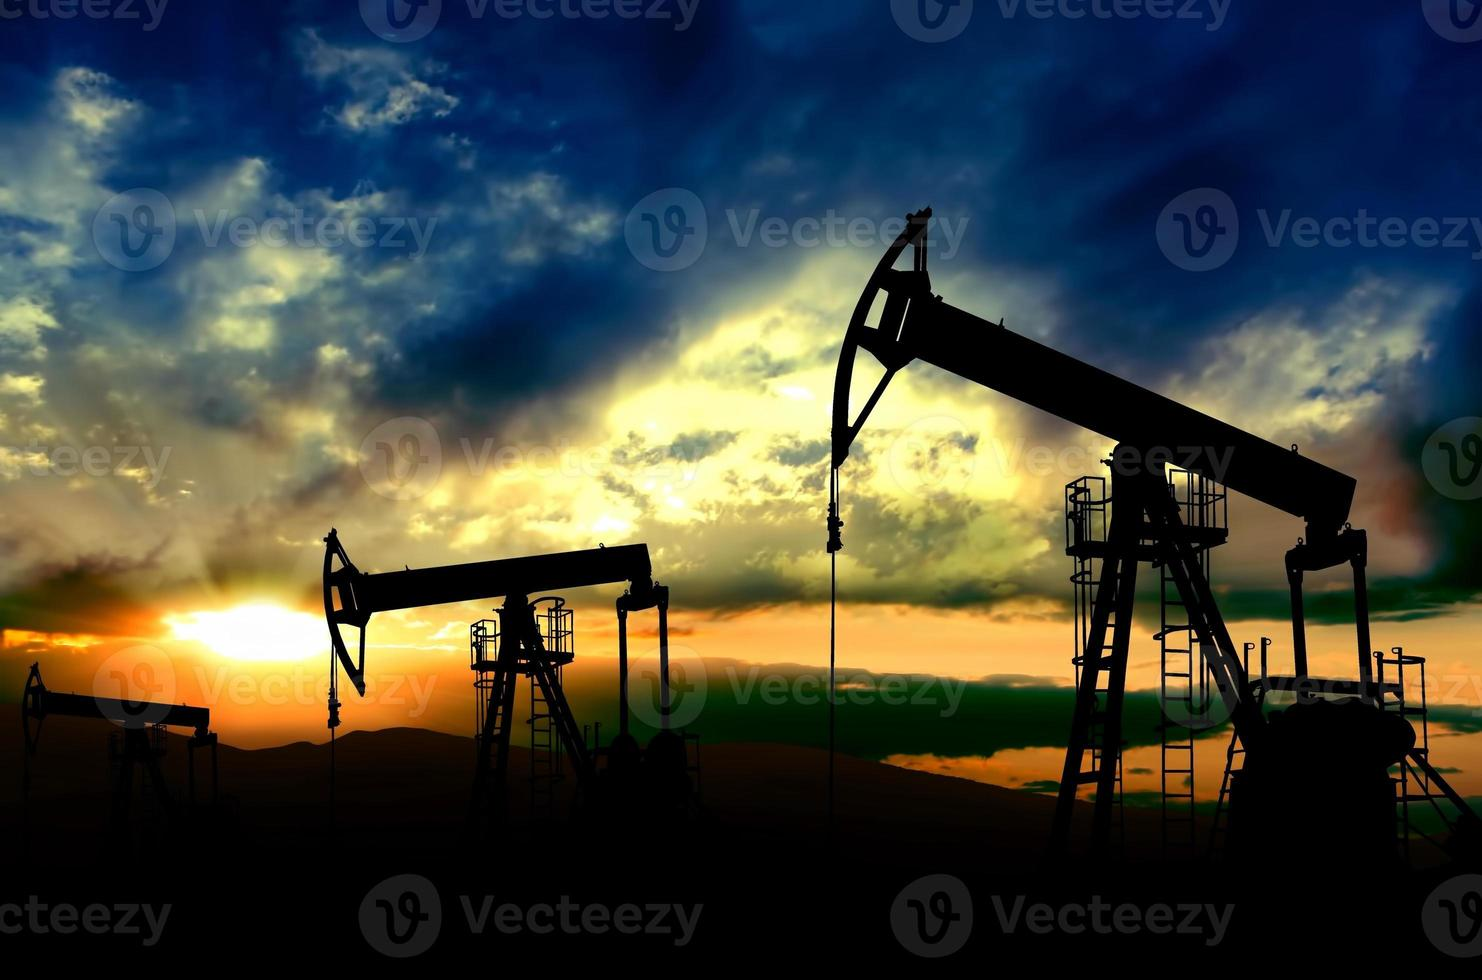 pompe olio lavorando su sfondo tramonto foto